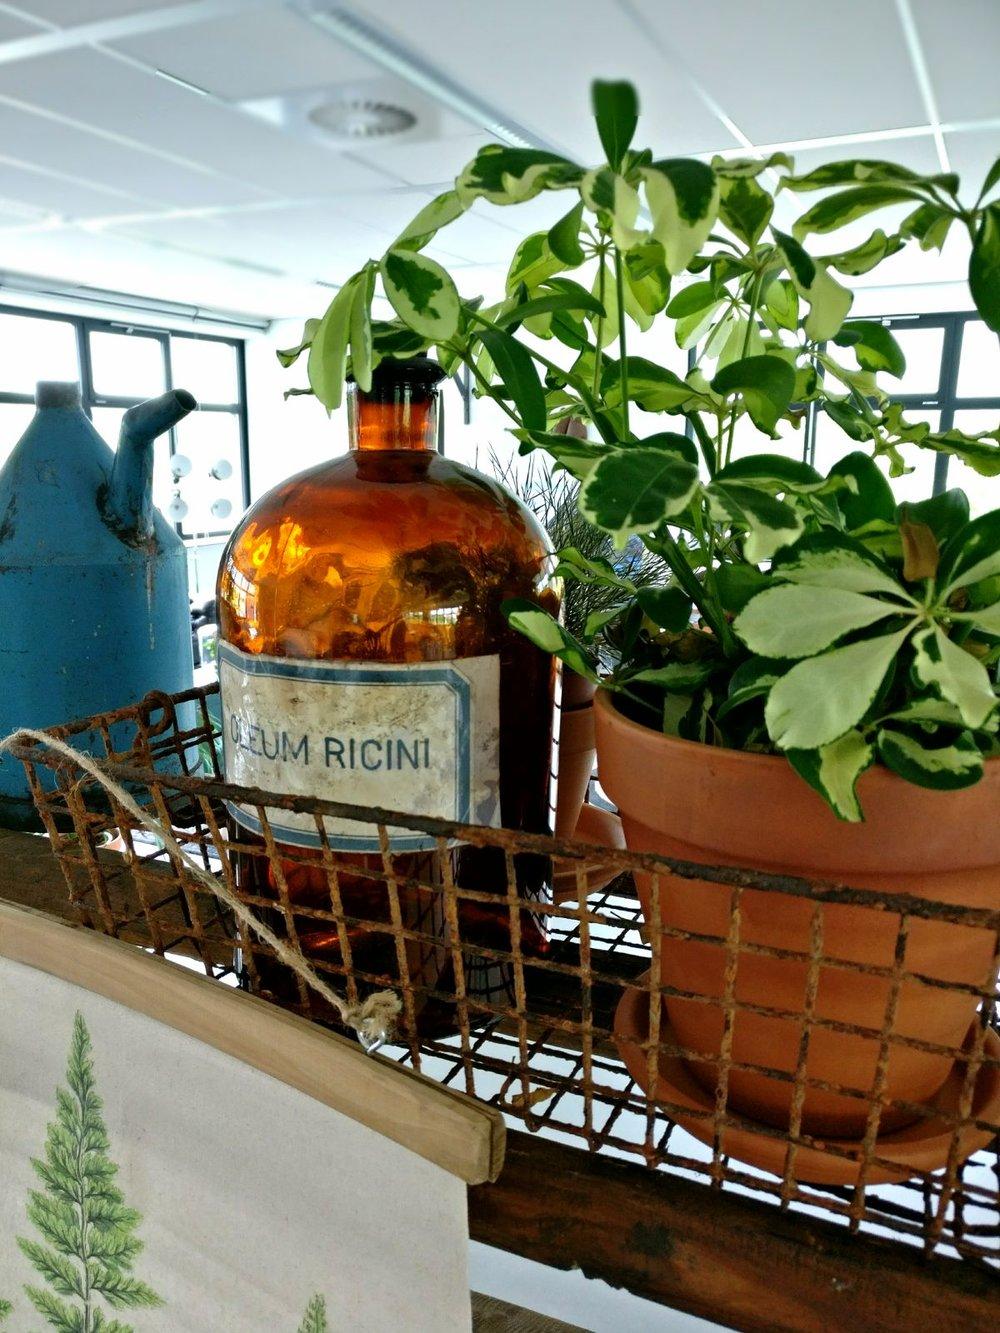 moderne kantoorruimte licht keuken apothekersfles apothekerspot vintage bakkersrek draadmand display groene planten urban jungle.jpg